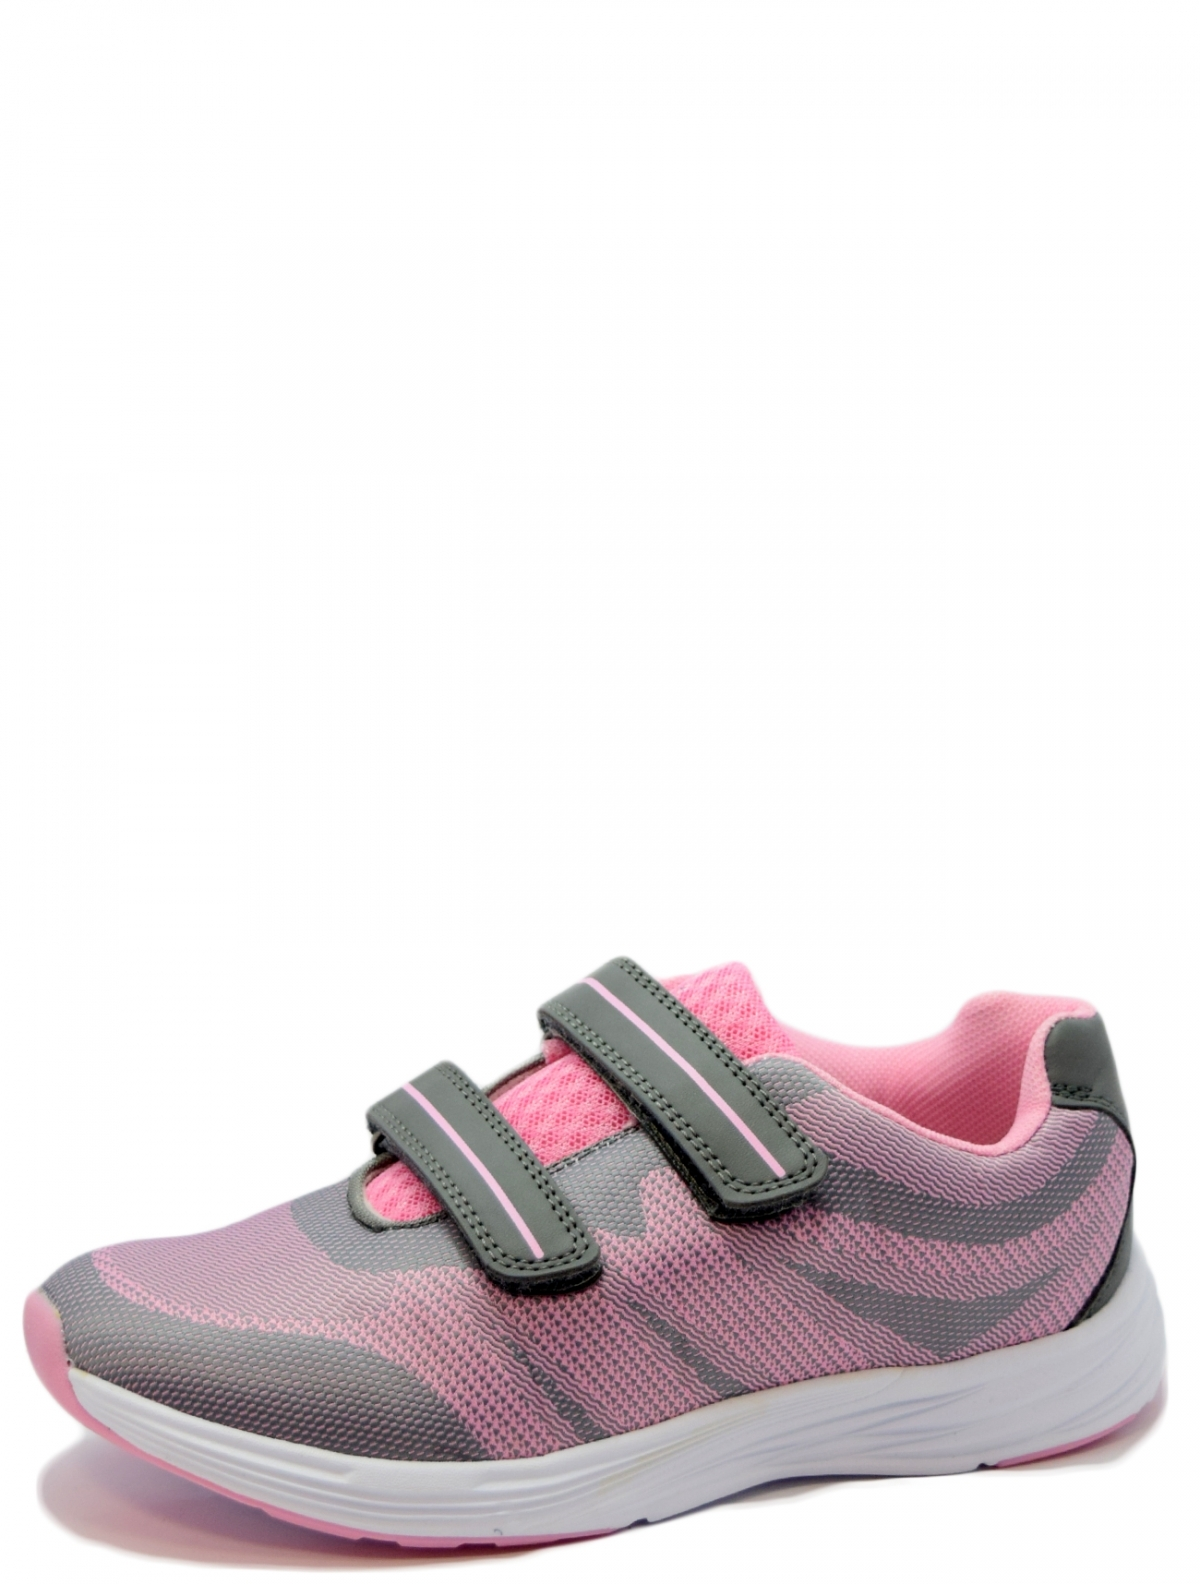 A-B81-01-C кроссовки для девочки